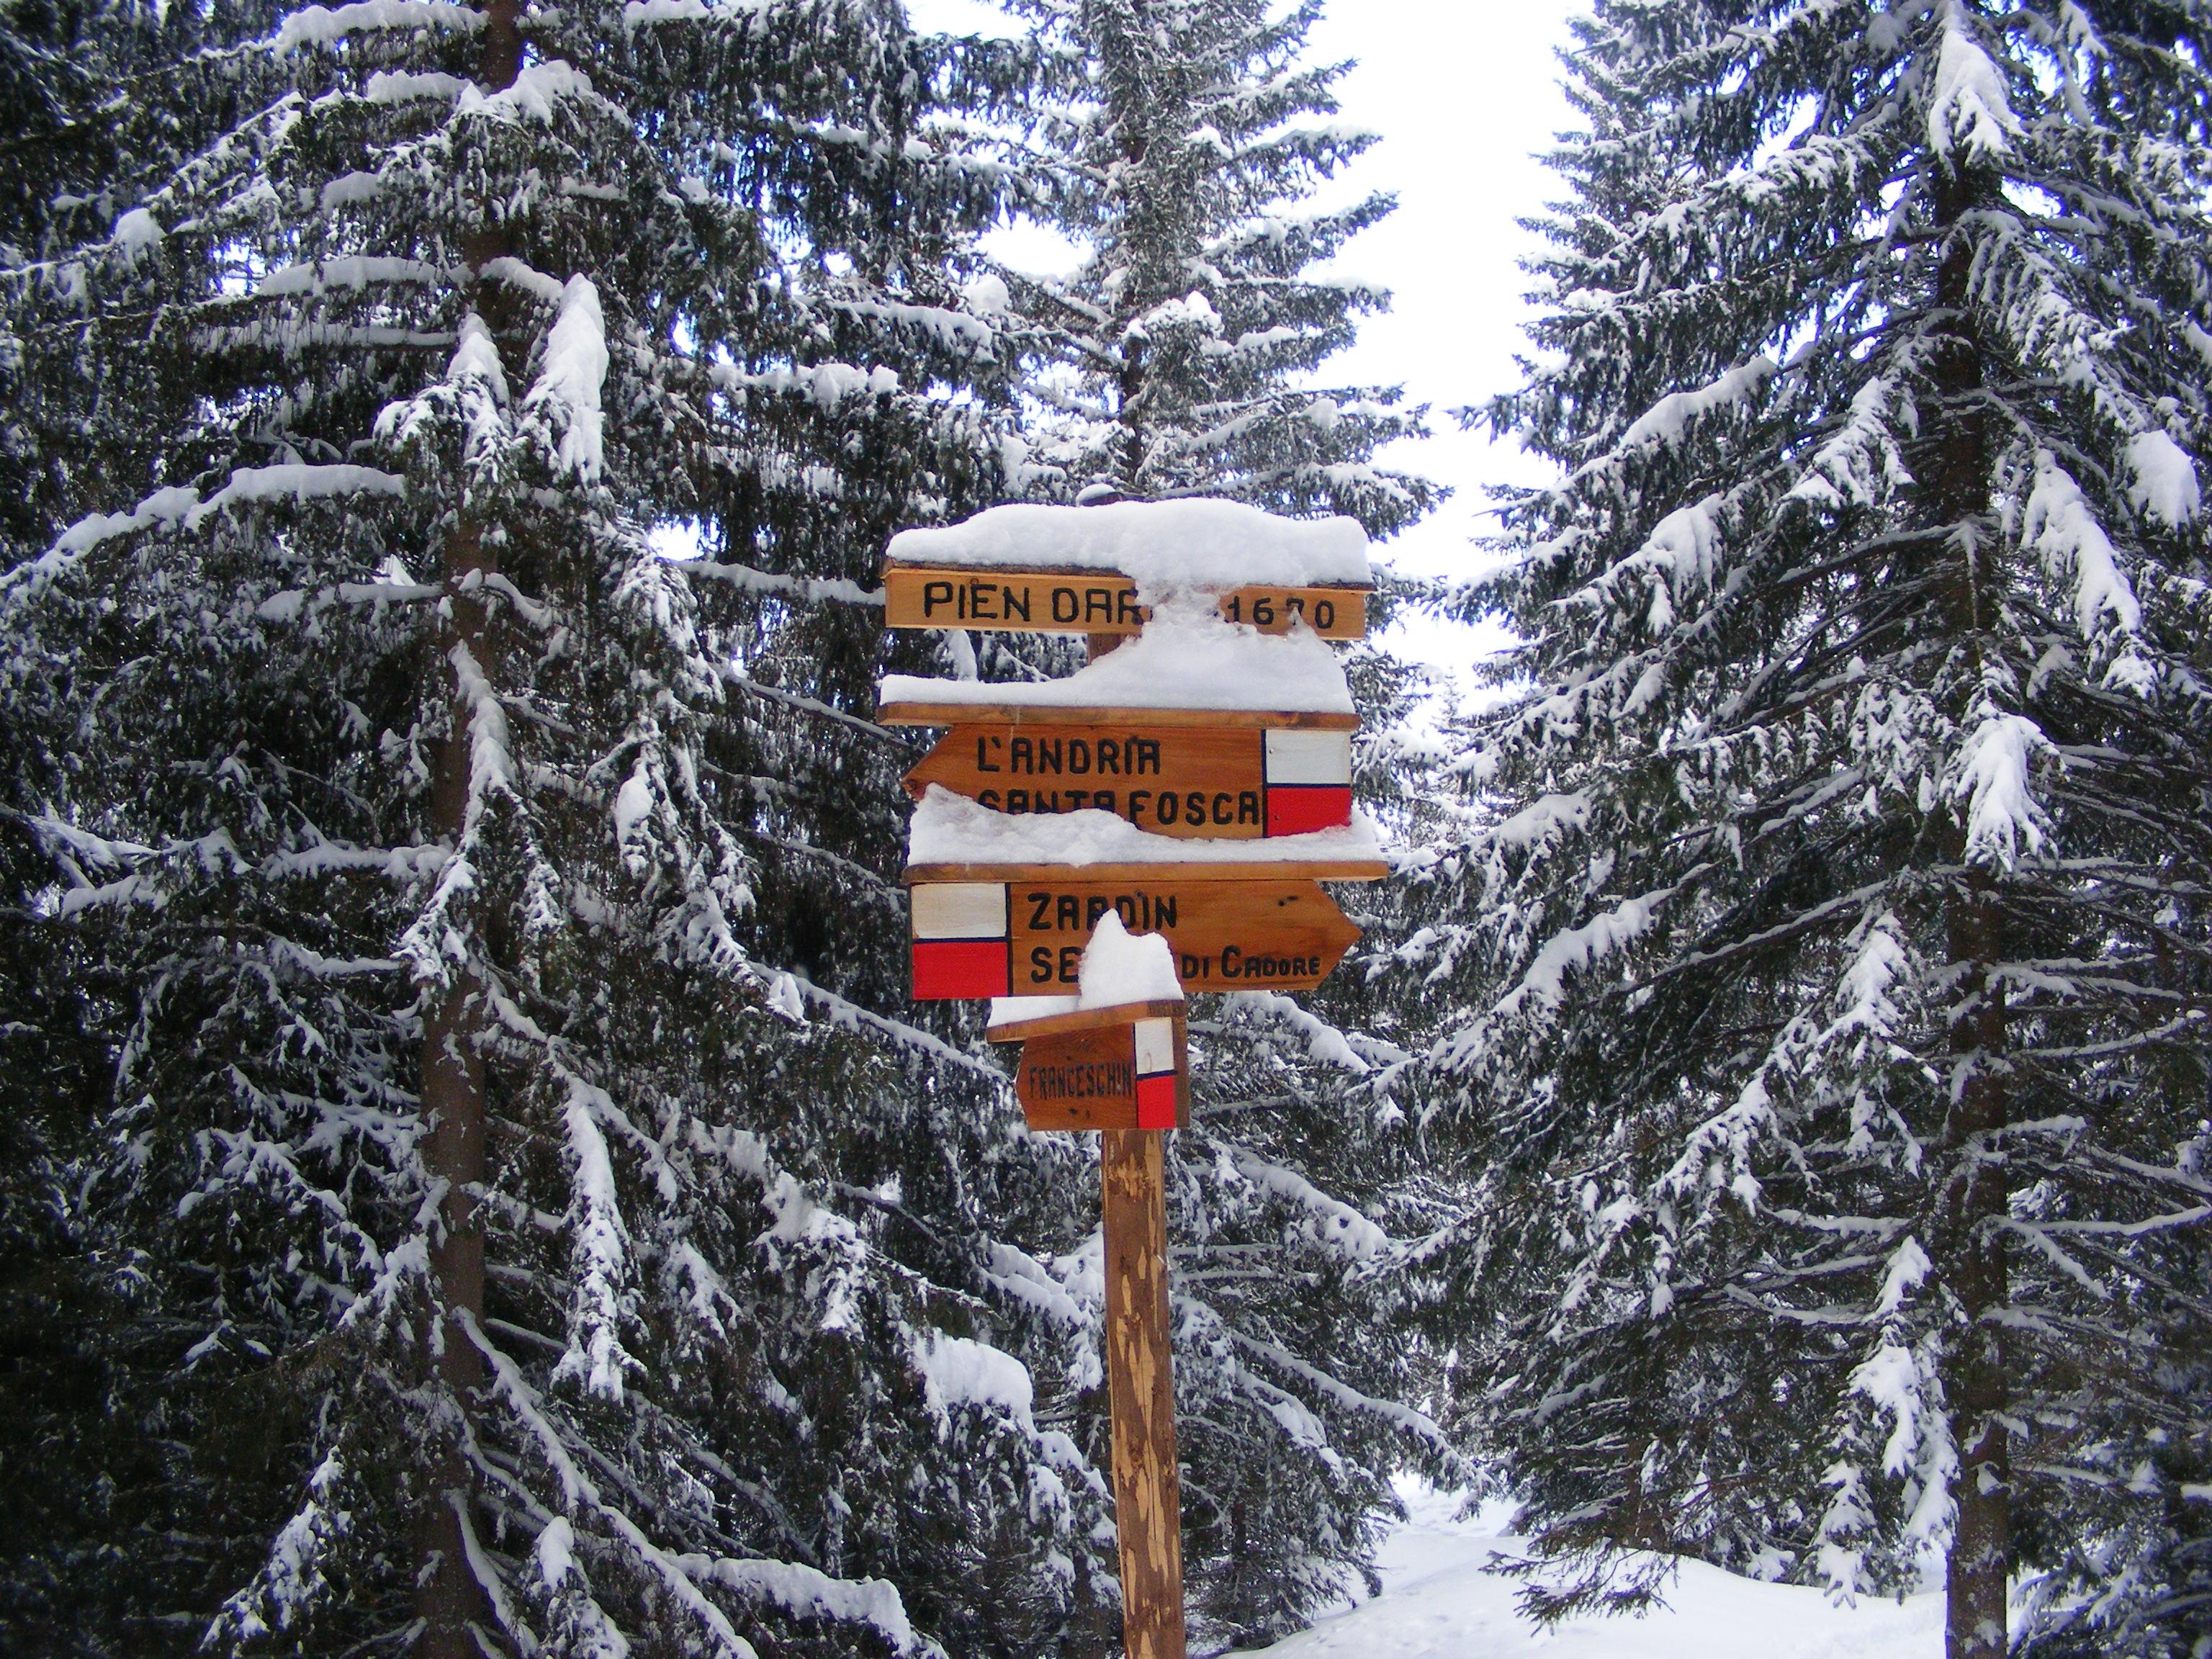 sentieri-itinerari-sci-alpinismo-ciaspole-neve